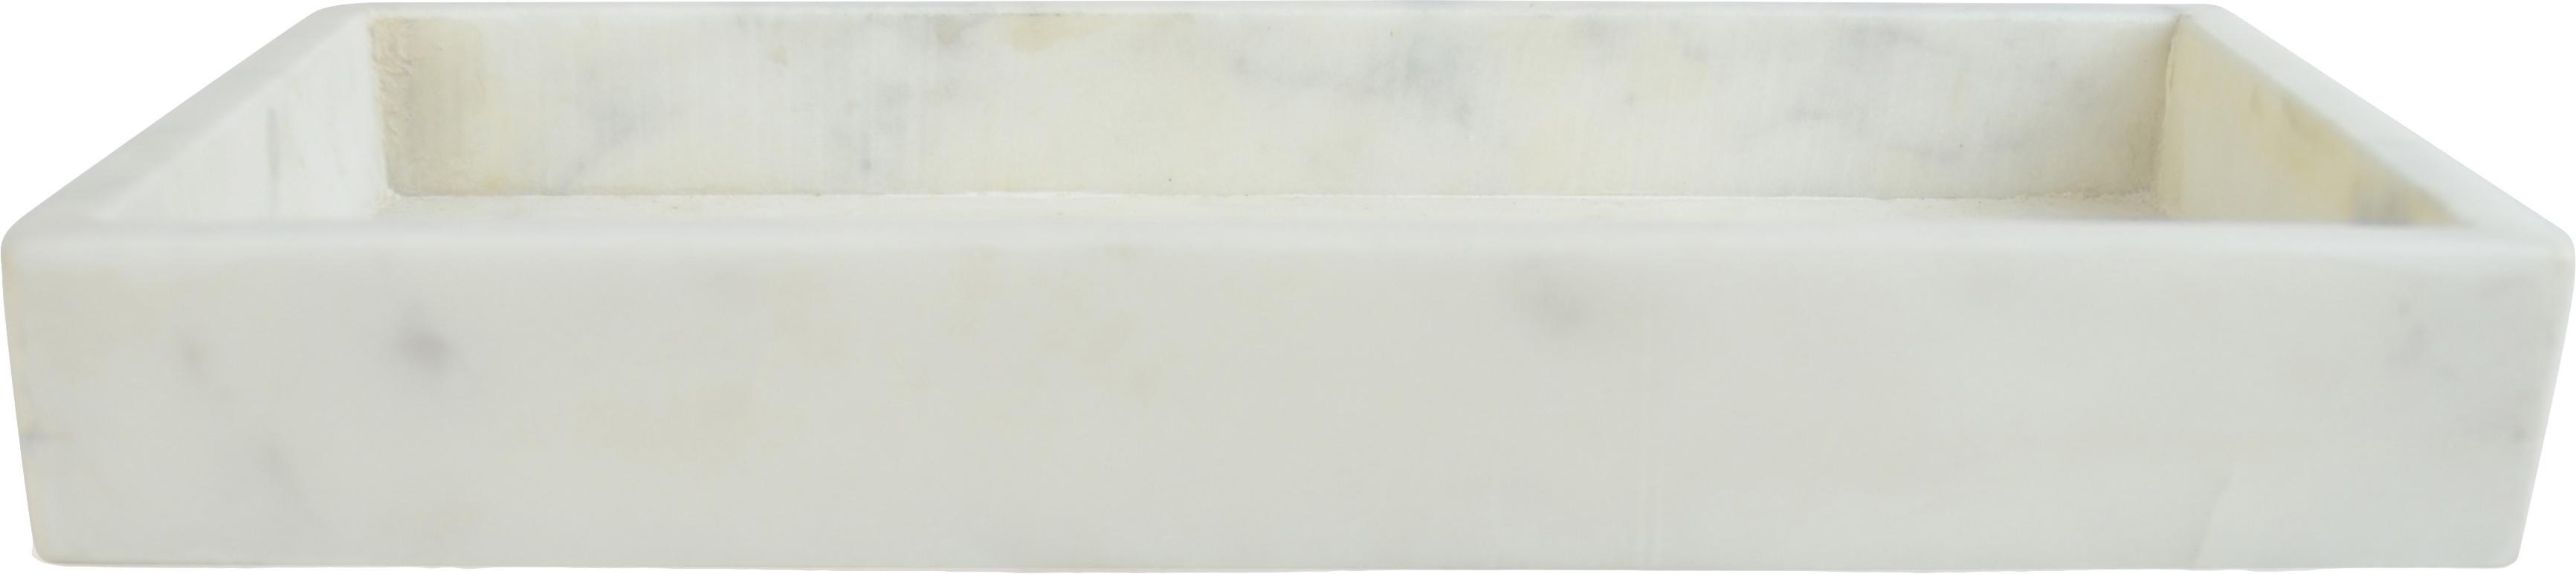 Deko-Marmor-Tablett Mera, Marmor, Weiß, marmoriert, B 30 x T 15 cm